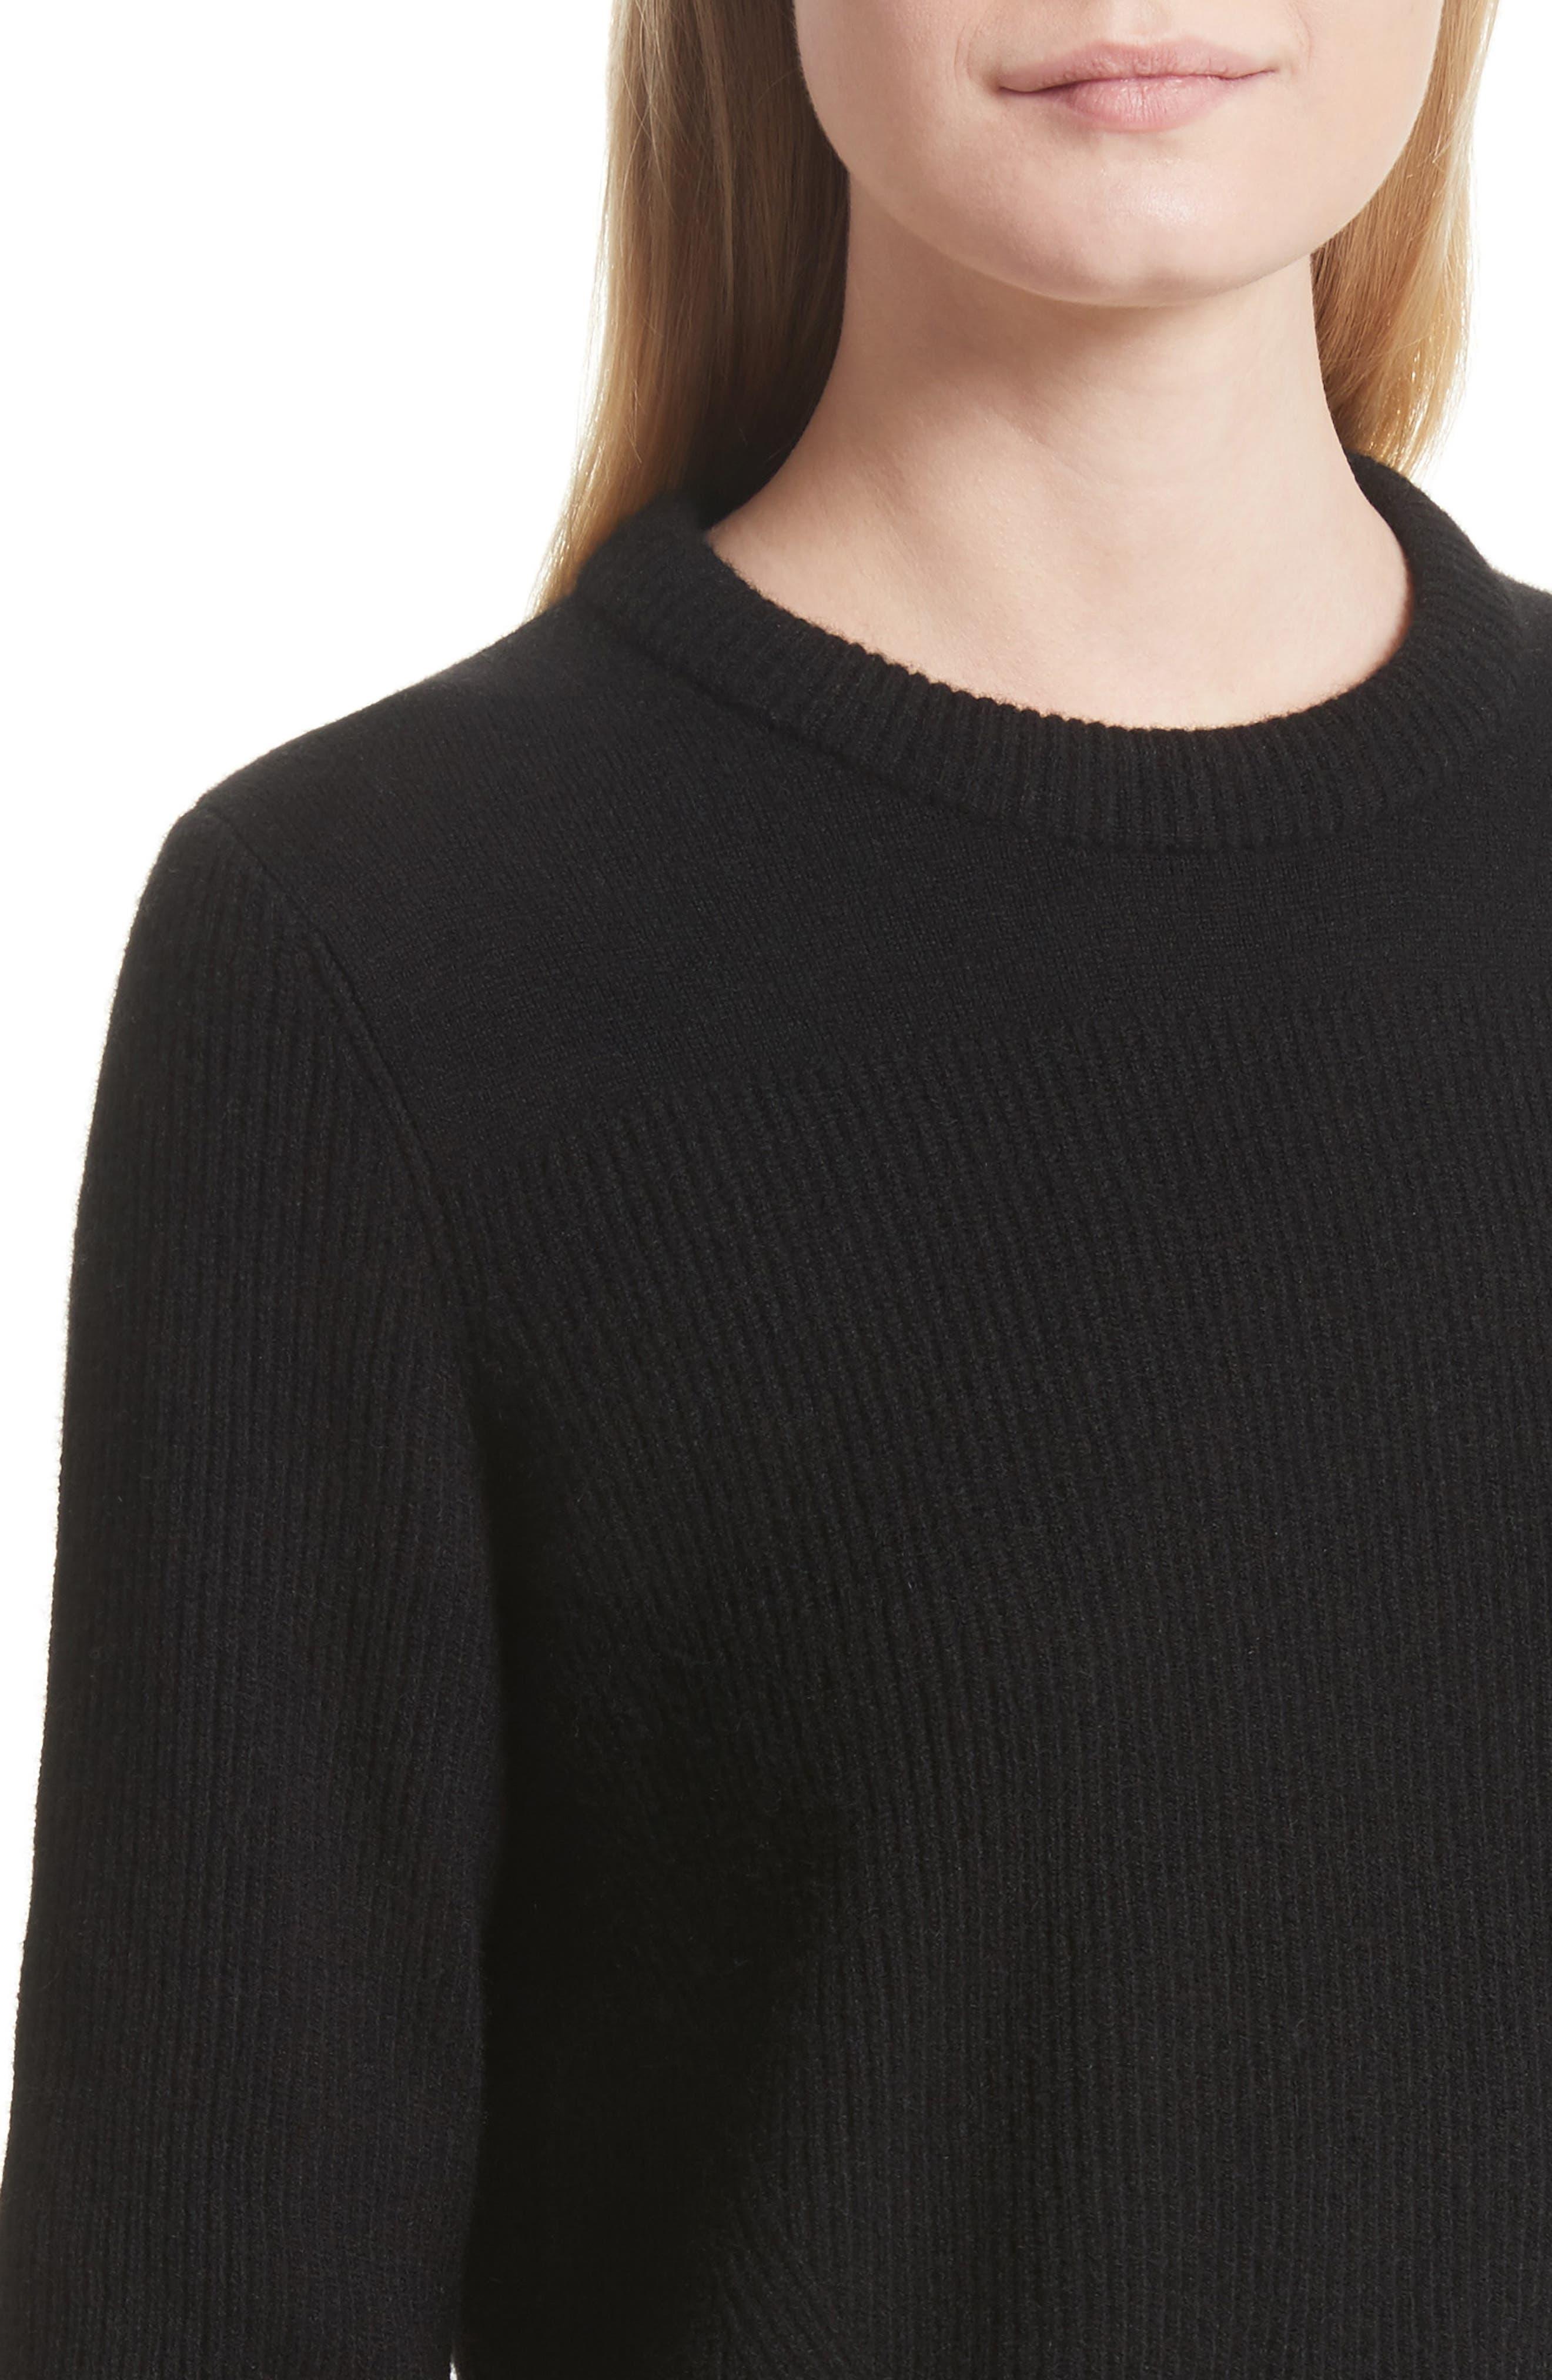 Ace Cashmere Crop Sweater,                             Alternate thumbnail 4, color,                             001